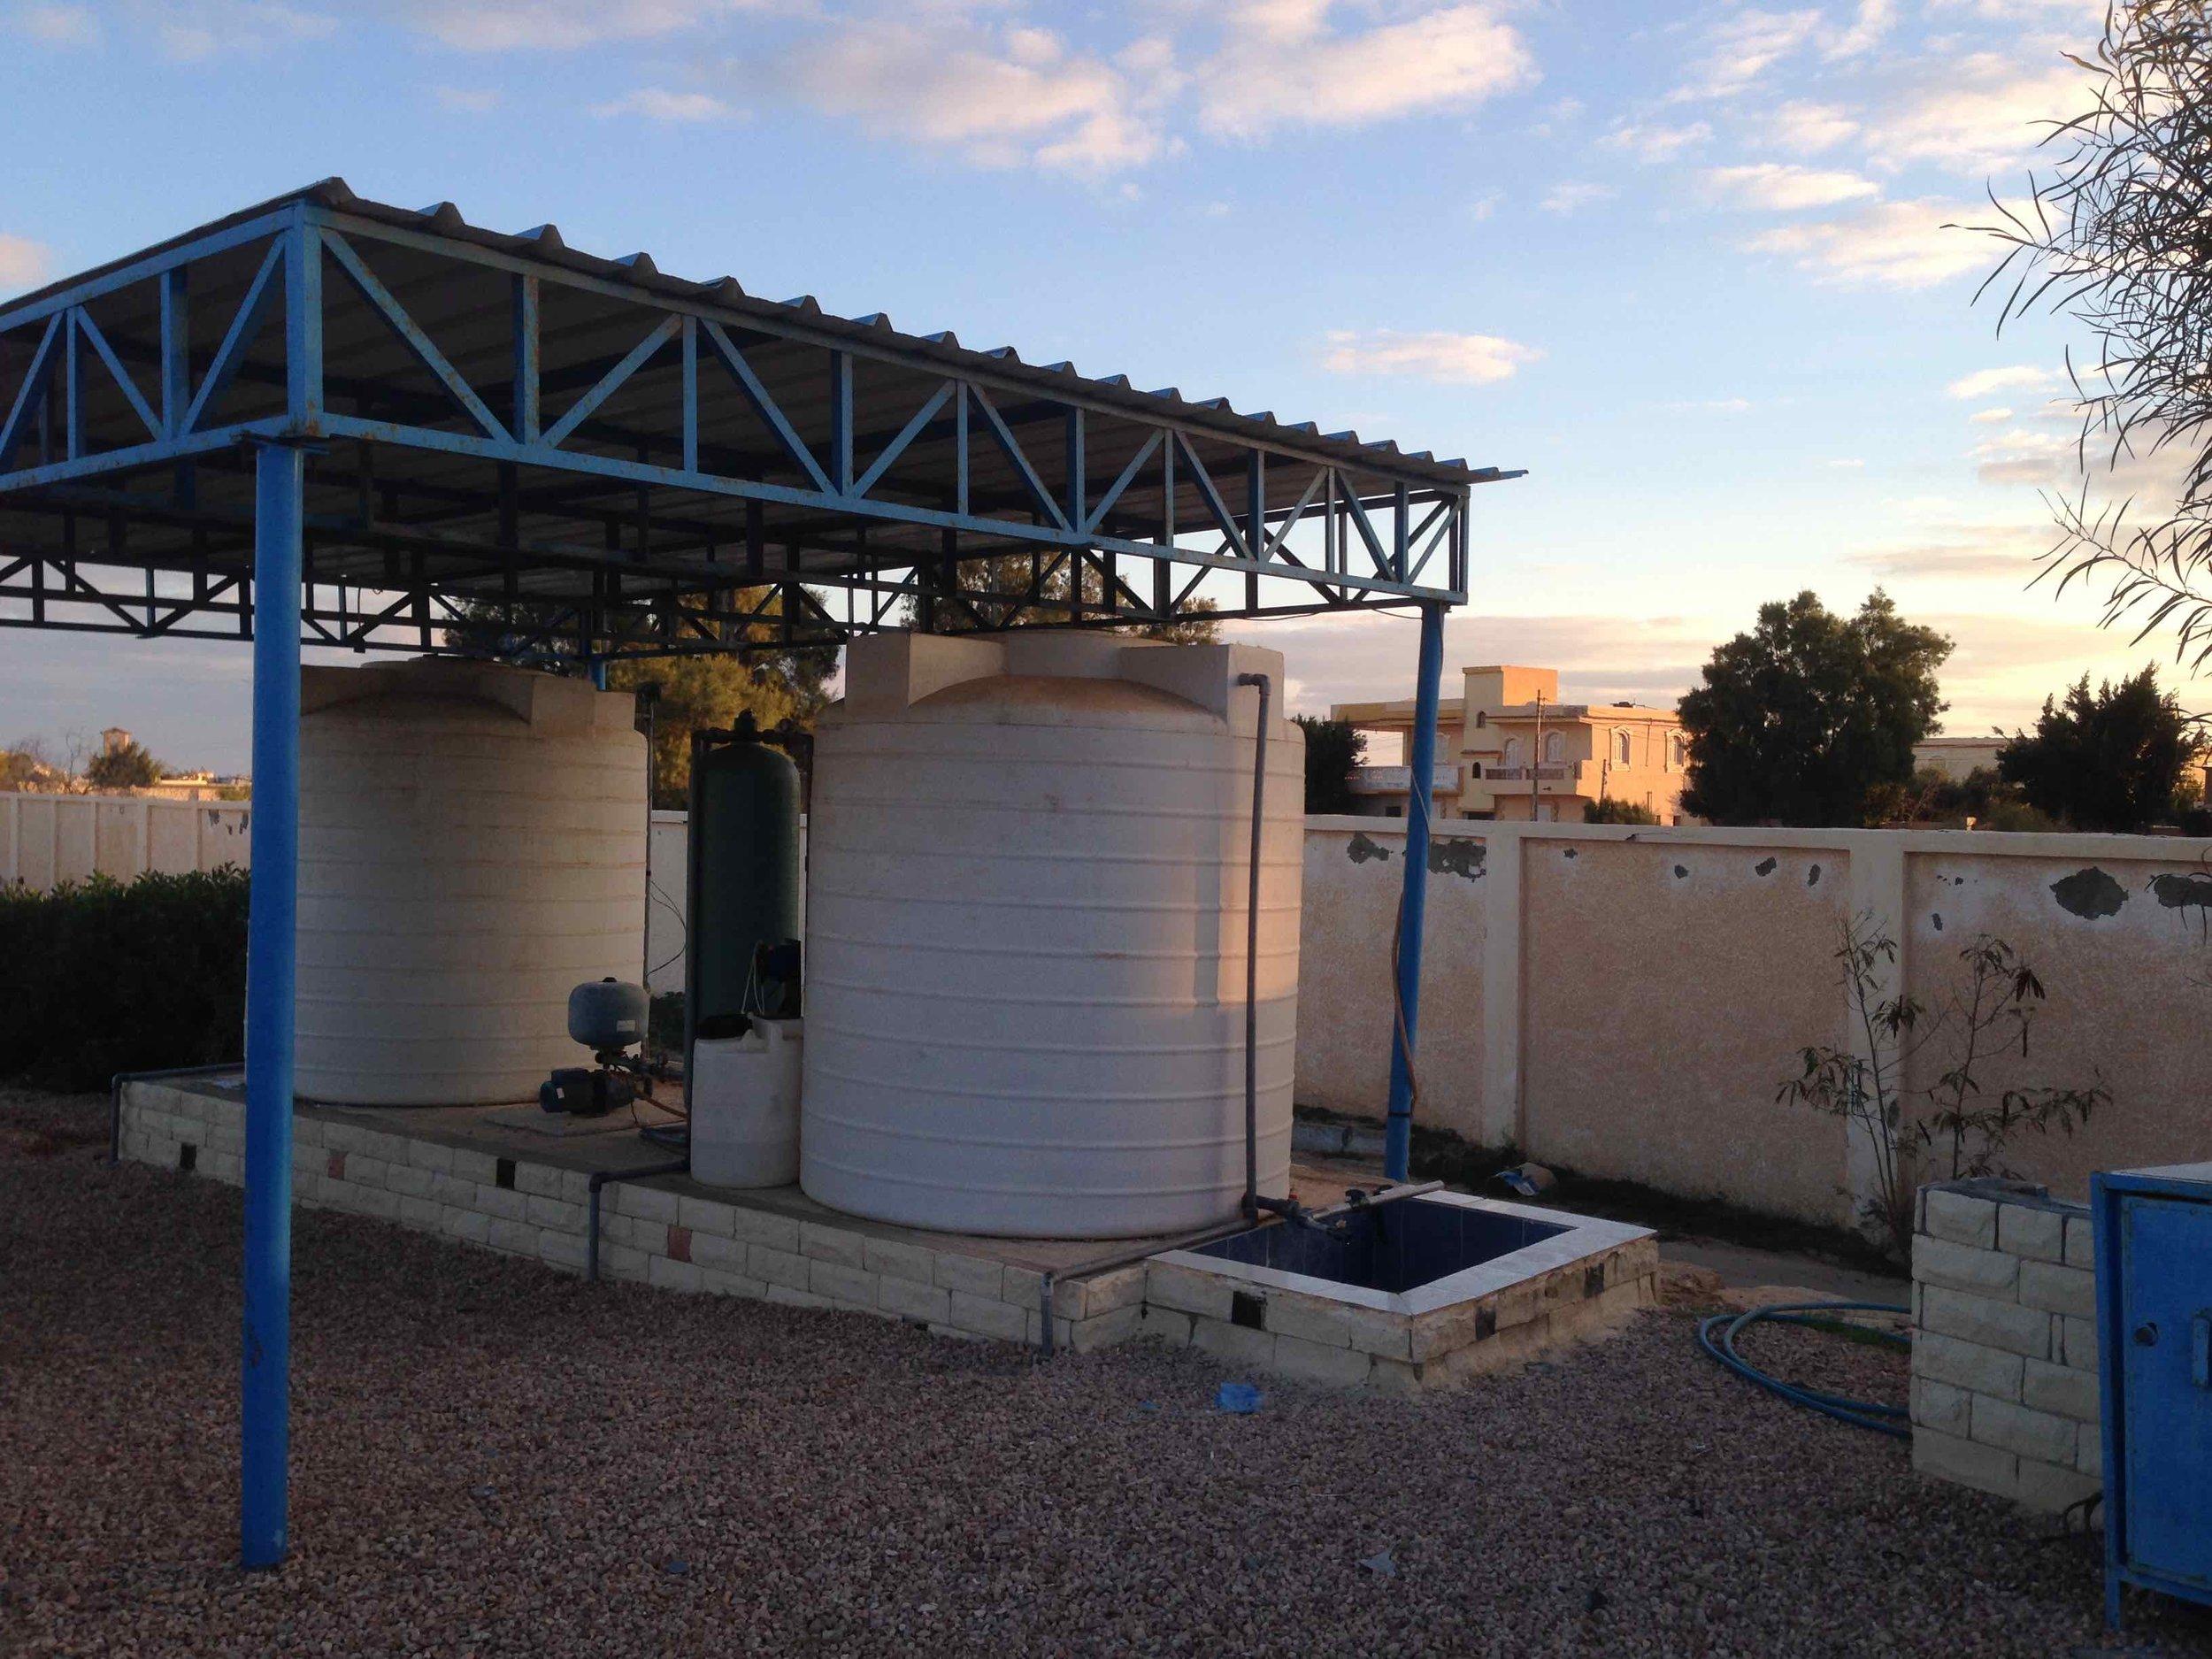 Solar-powered portable desalination